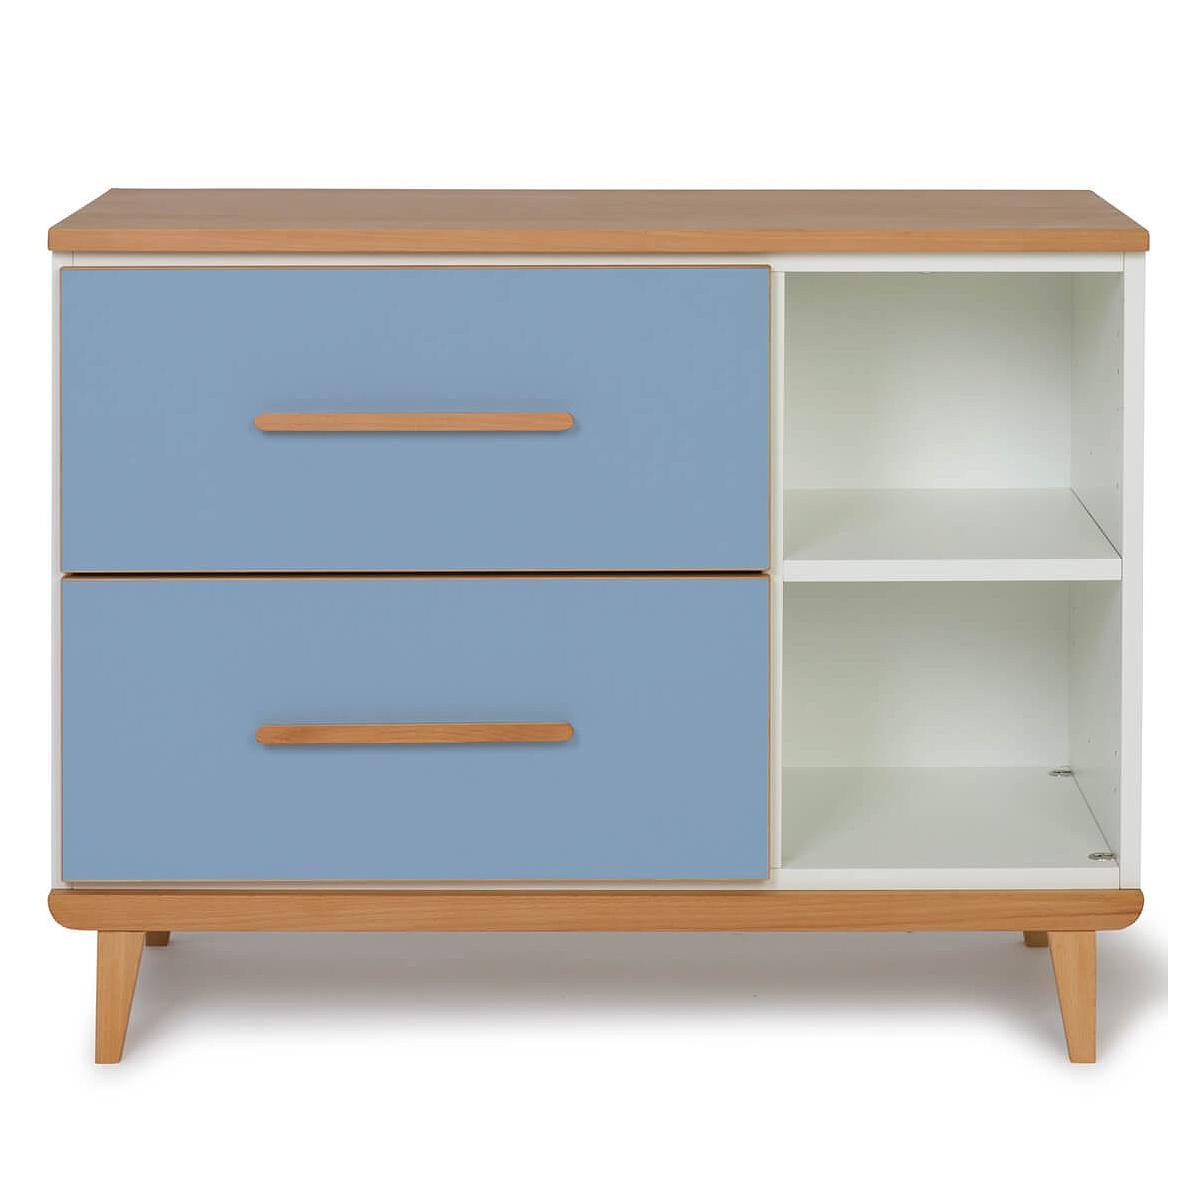 Petit meuble 2 tiroirs NADO By A.K. capri blue